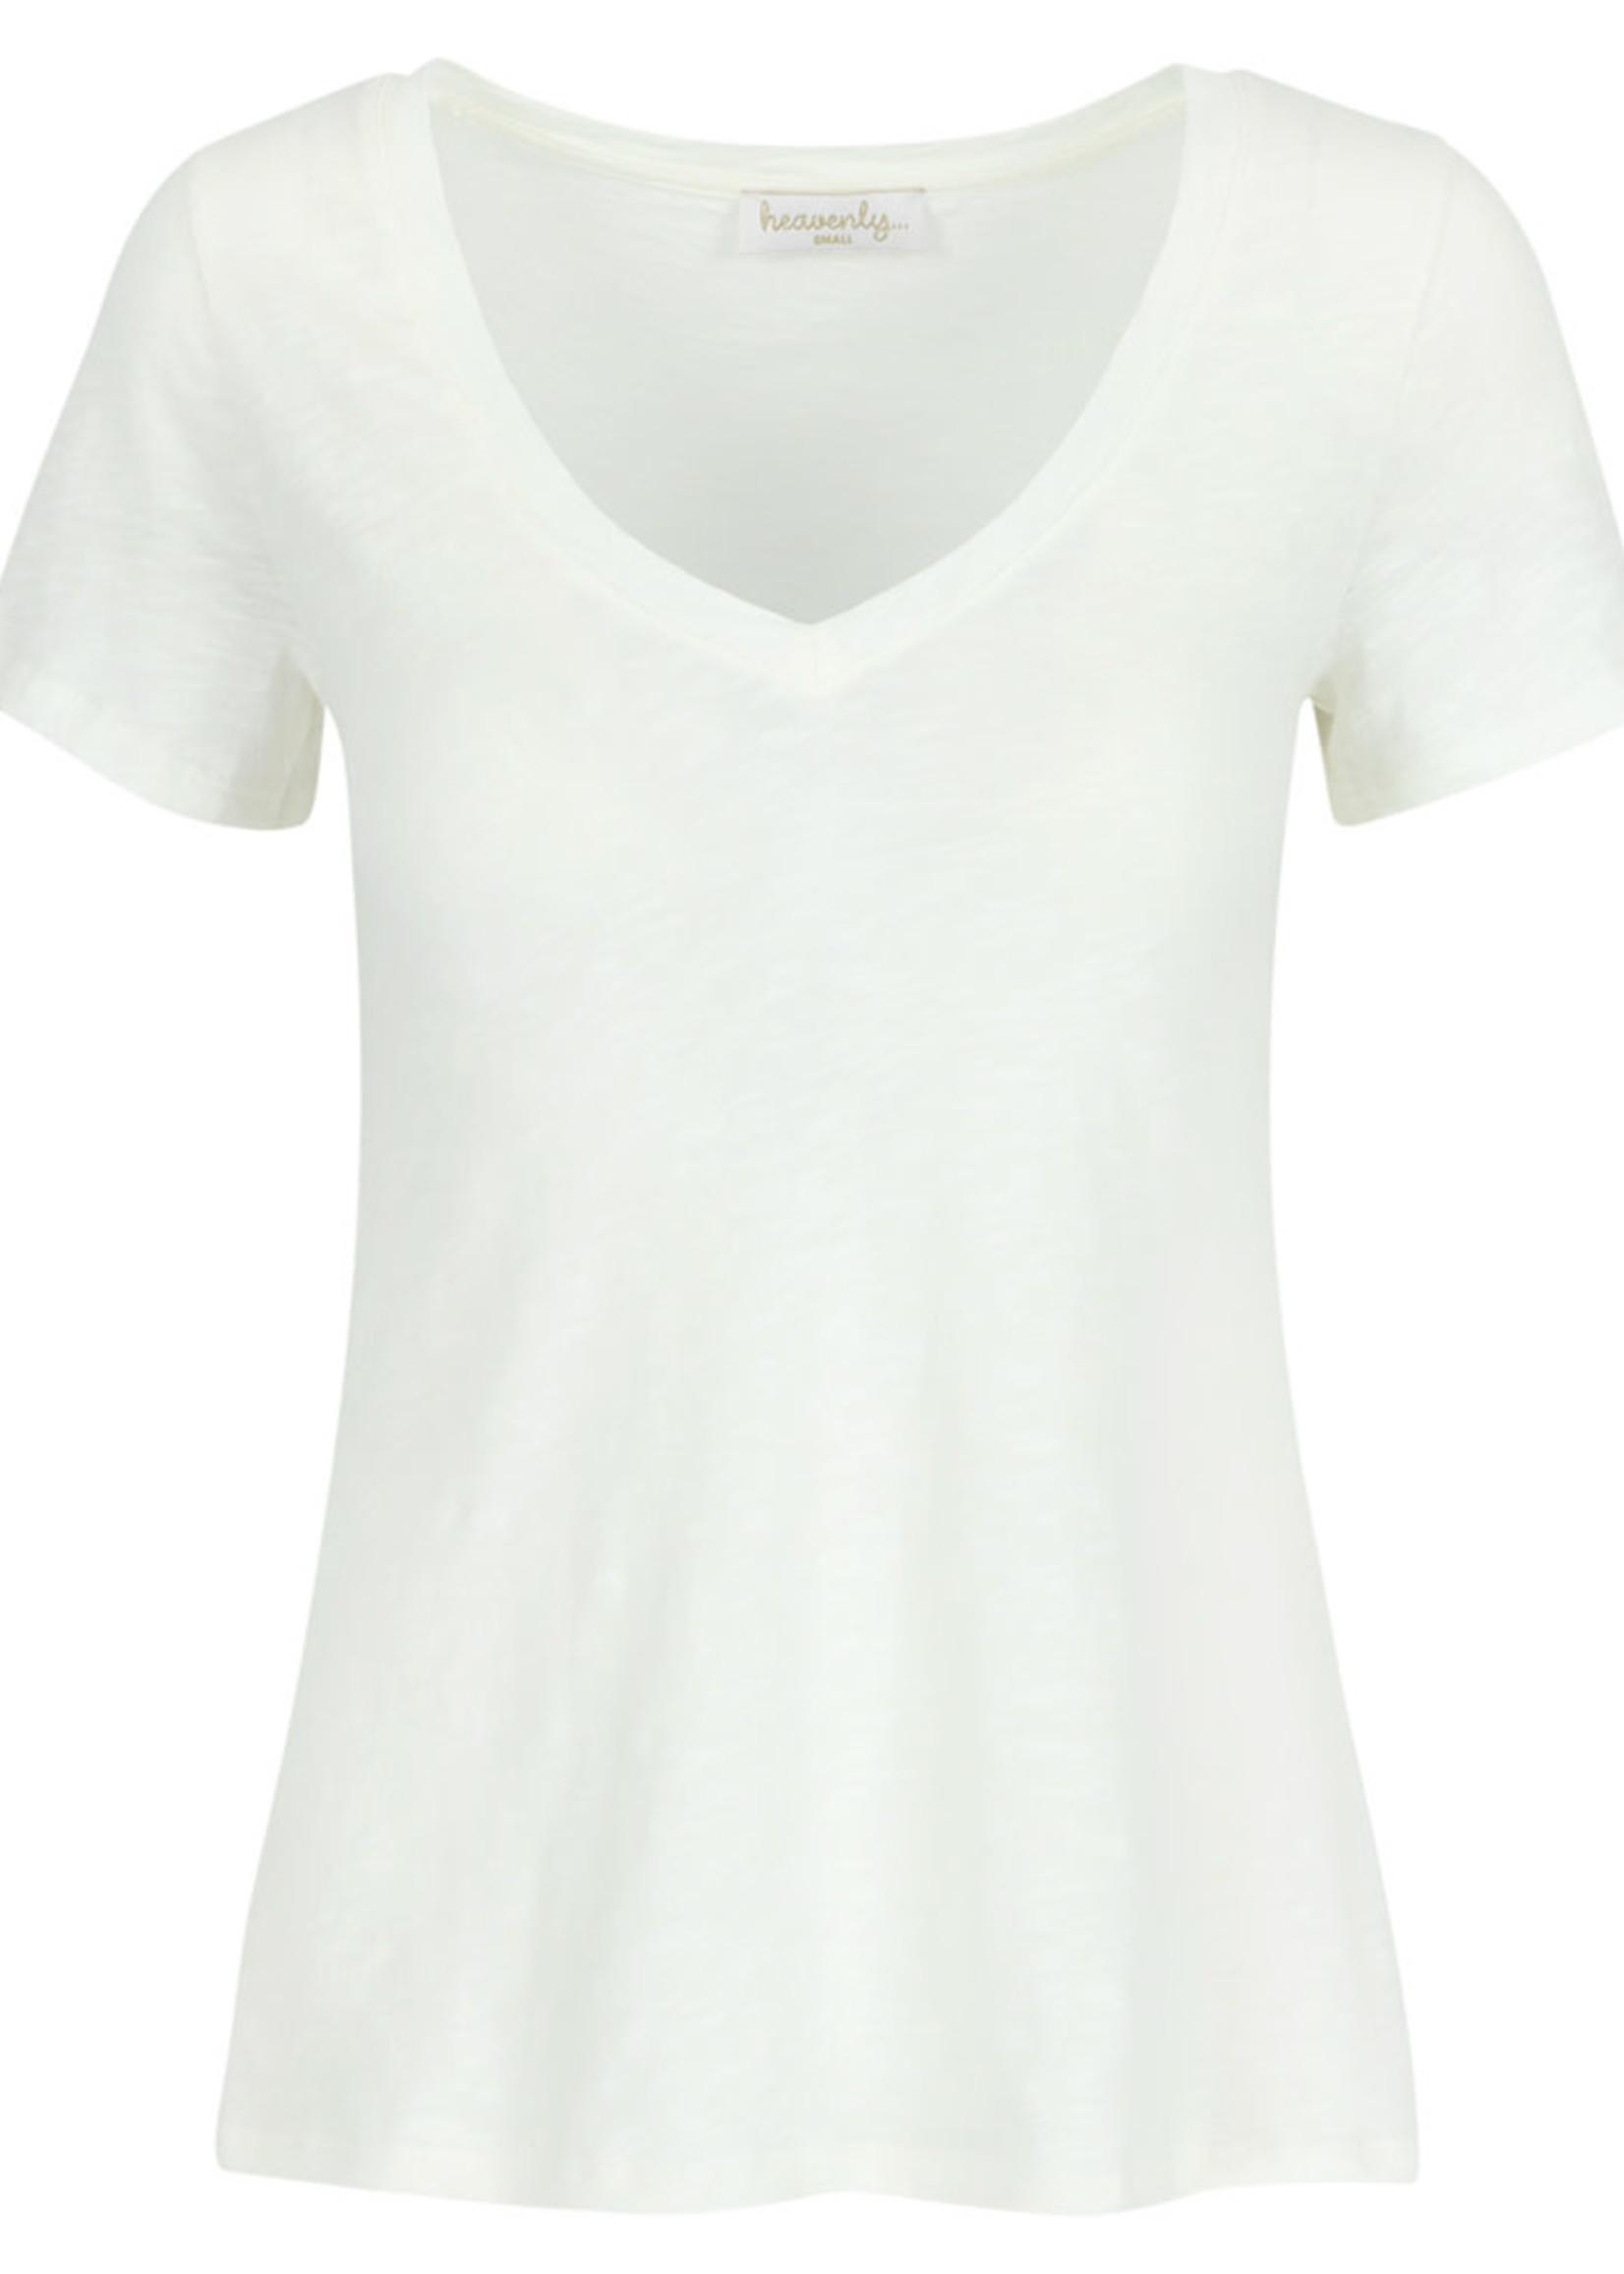 Heavenly Charli - Off White